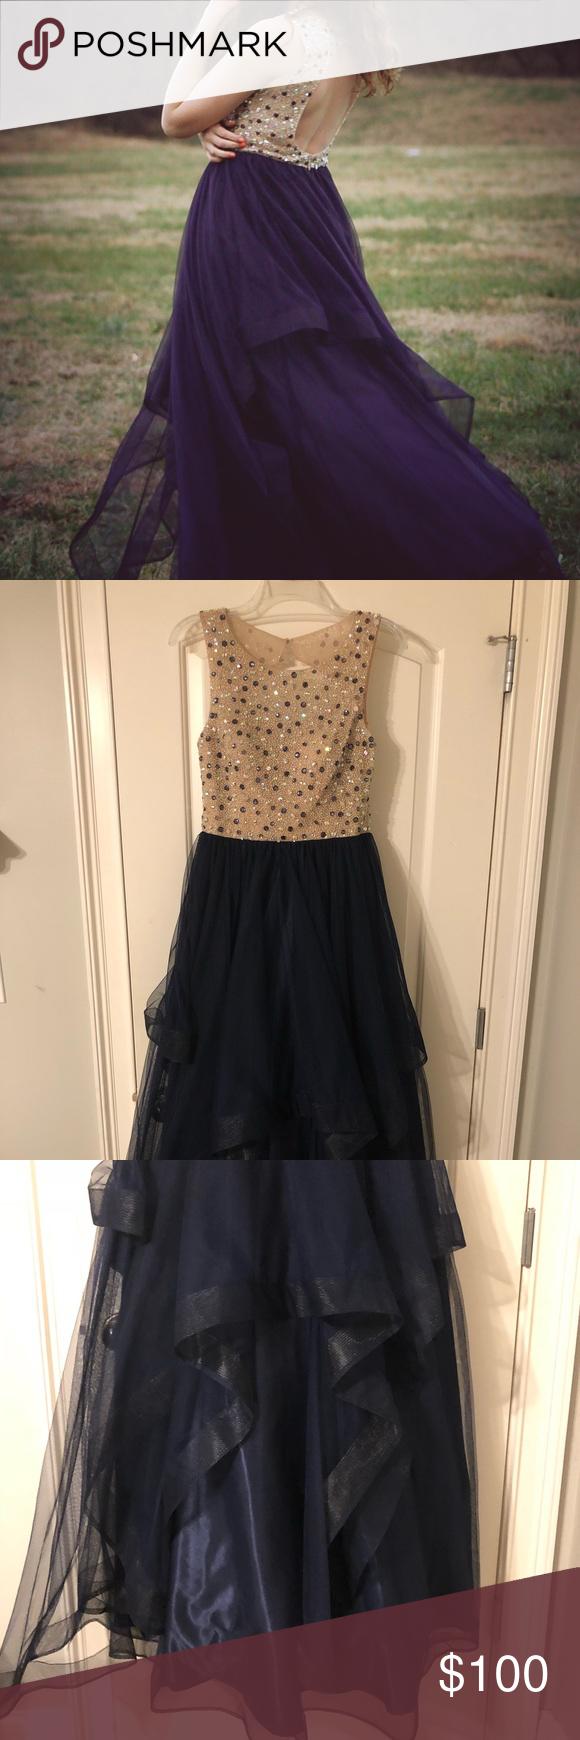 Bee darlin beaded navy prom dress with ruffles beautiful prom dress